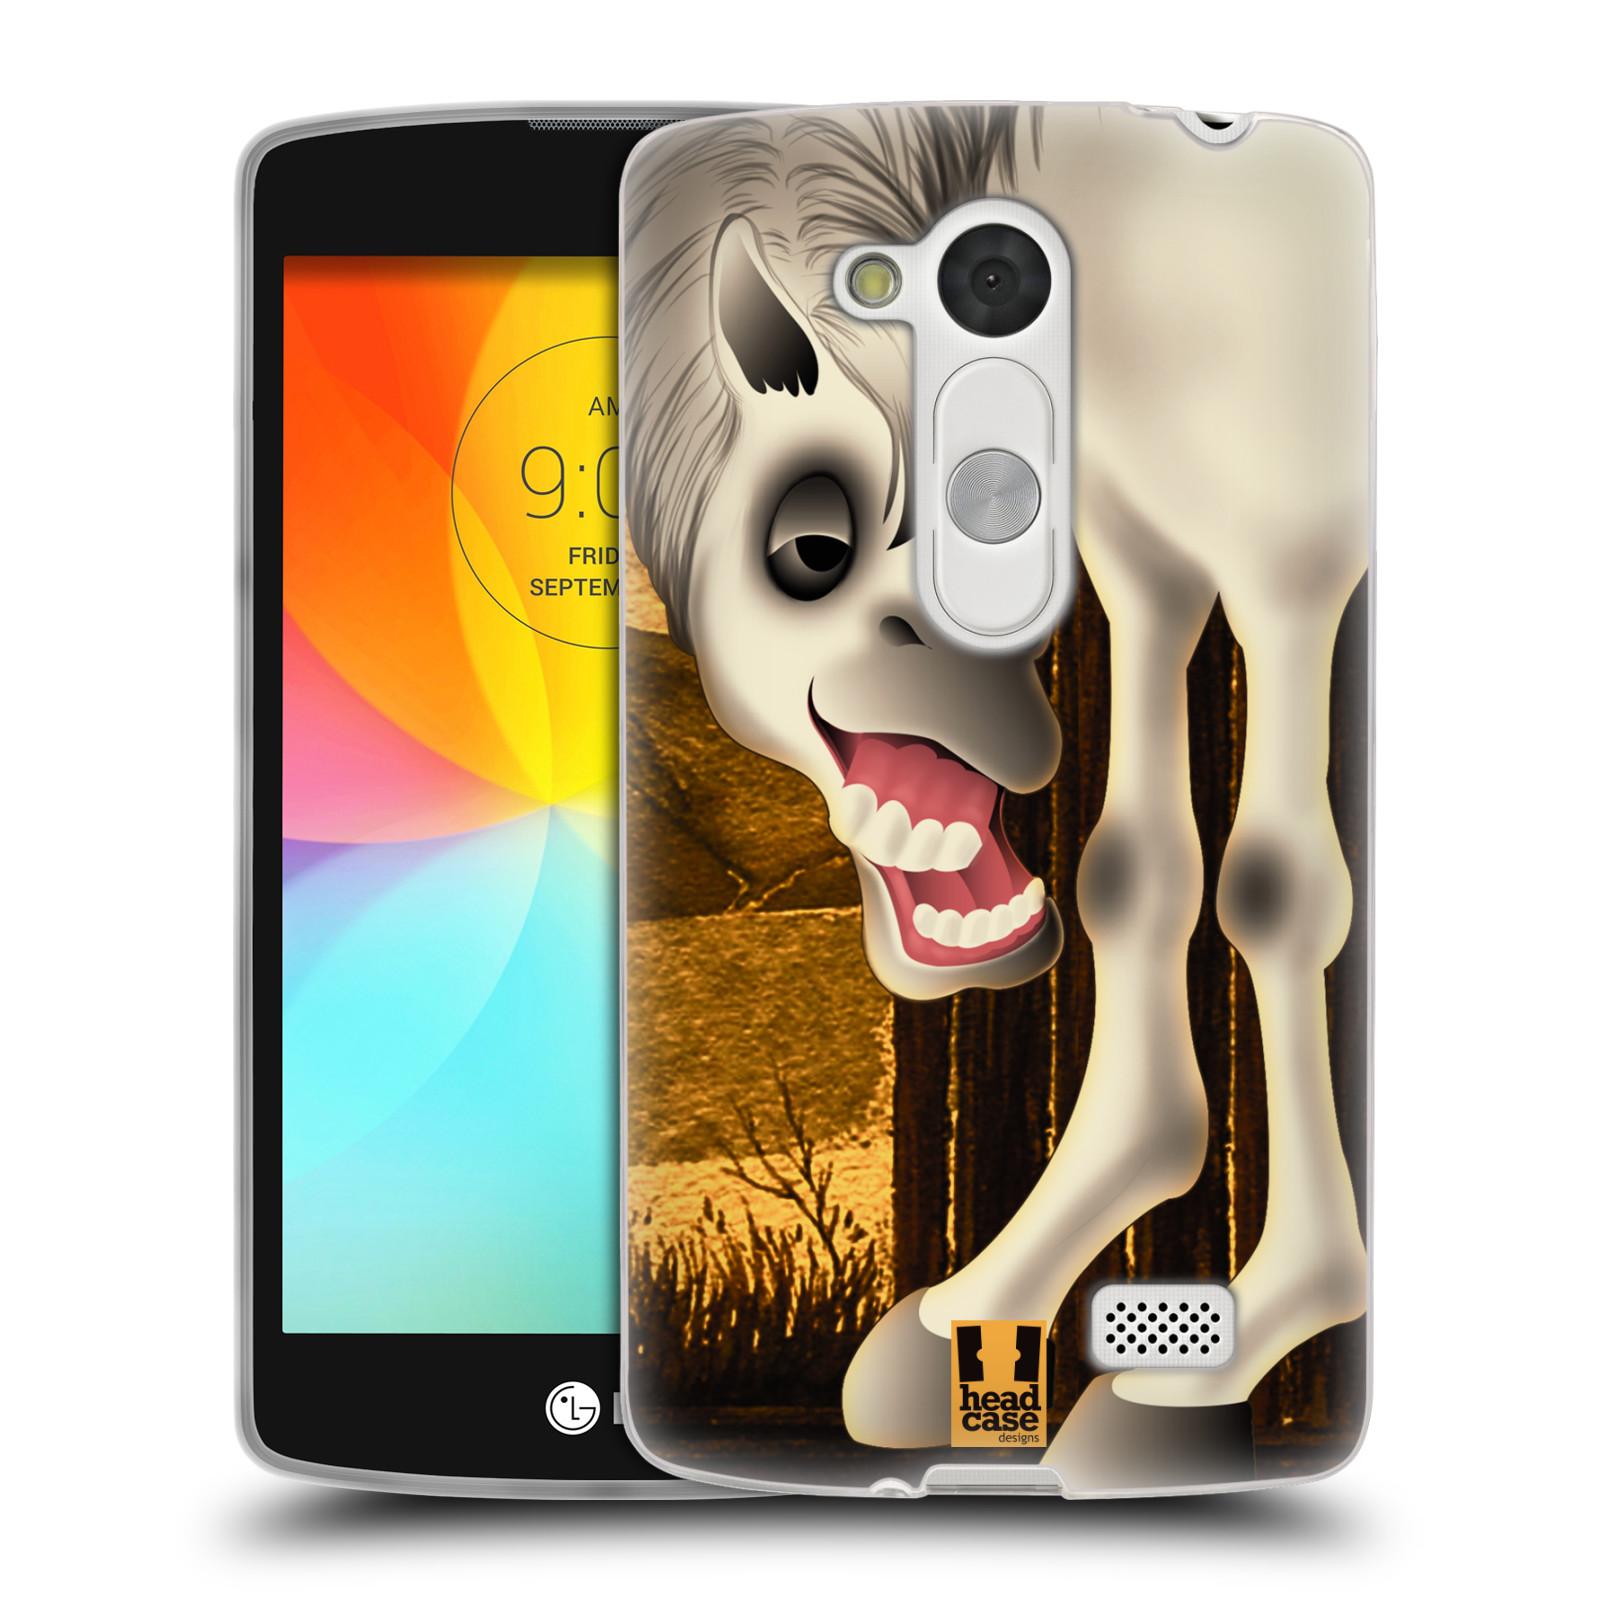 HEAD CASE silikonový obal na mobil LG L Fino D290n / LG L Fino Dual D295 vzor dlouhé nohy kreslená zvířátka kůň